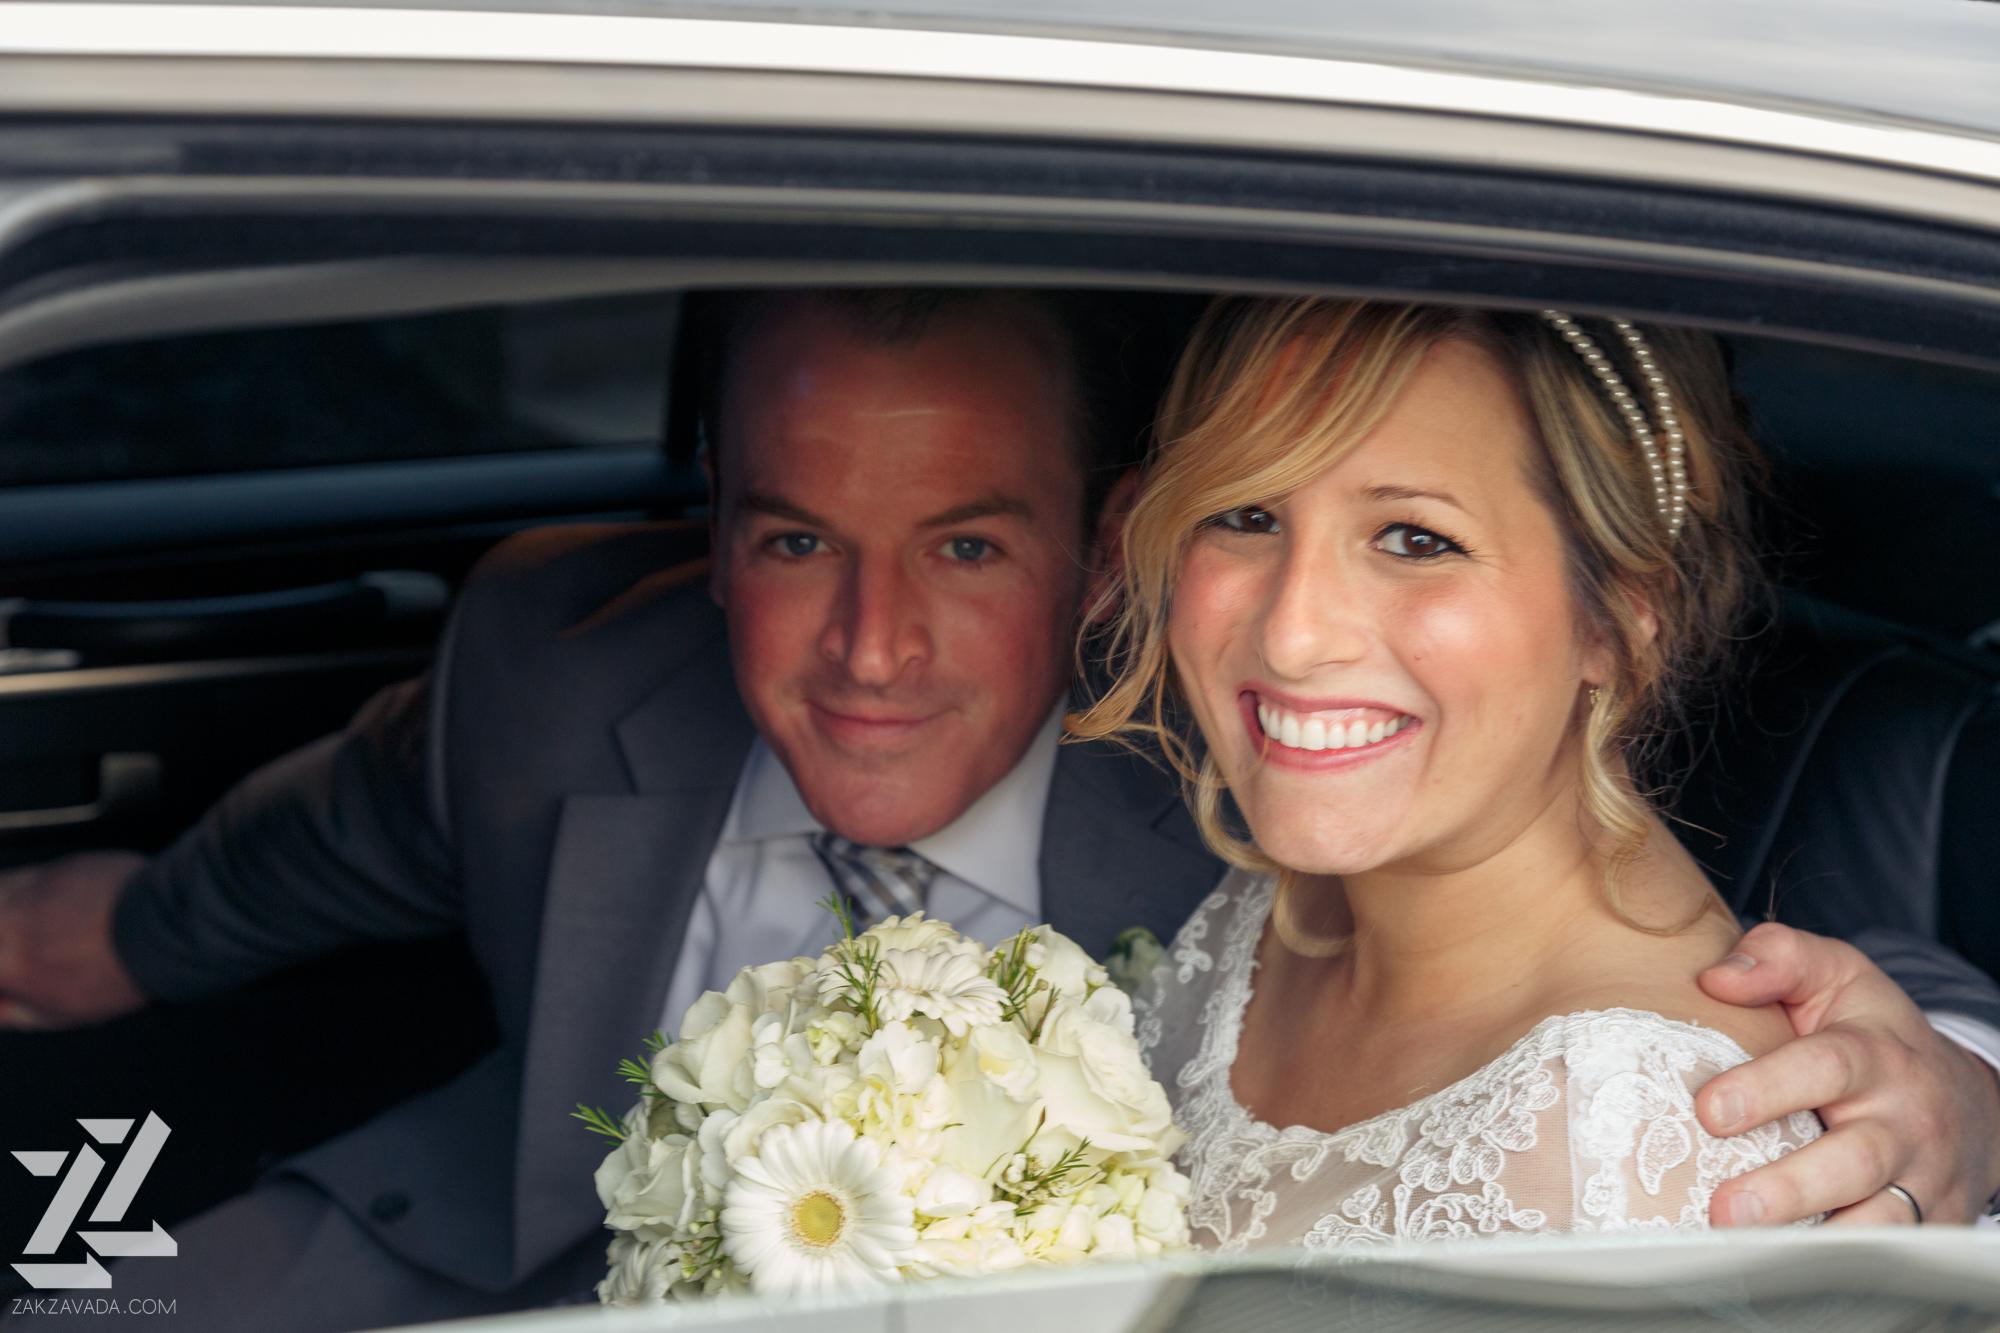 scranton-wedding-photography-zak-zavada-meganJonathan-373.jpg